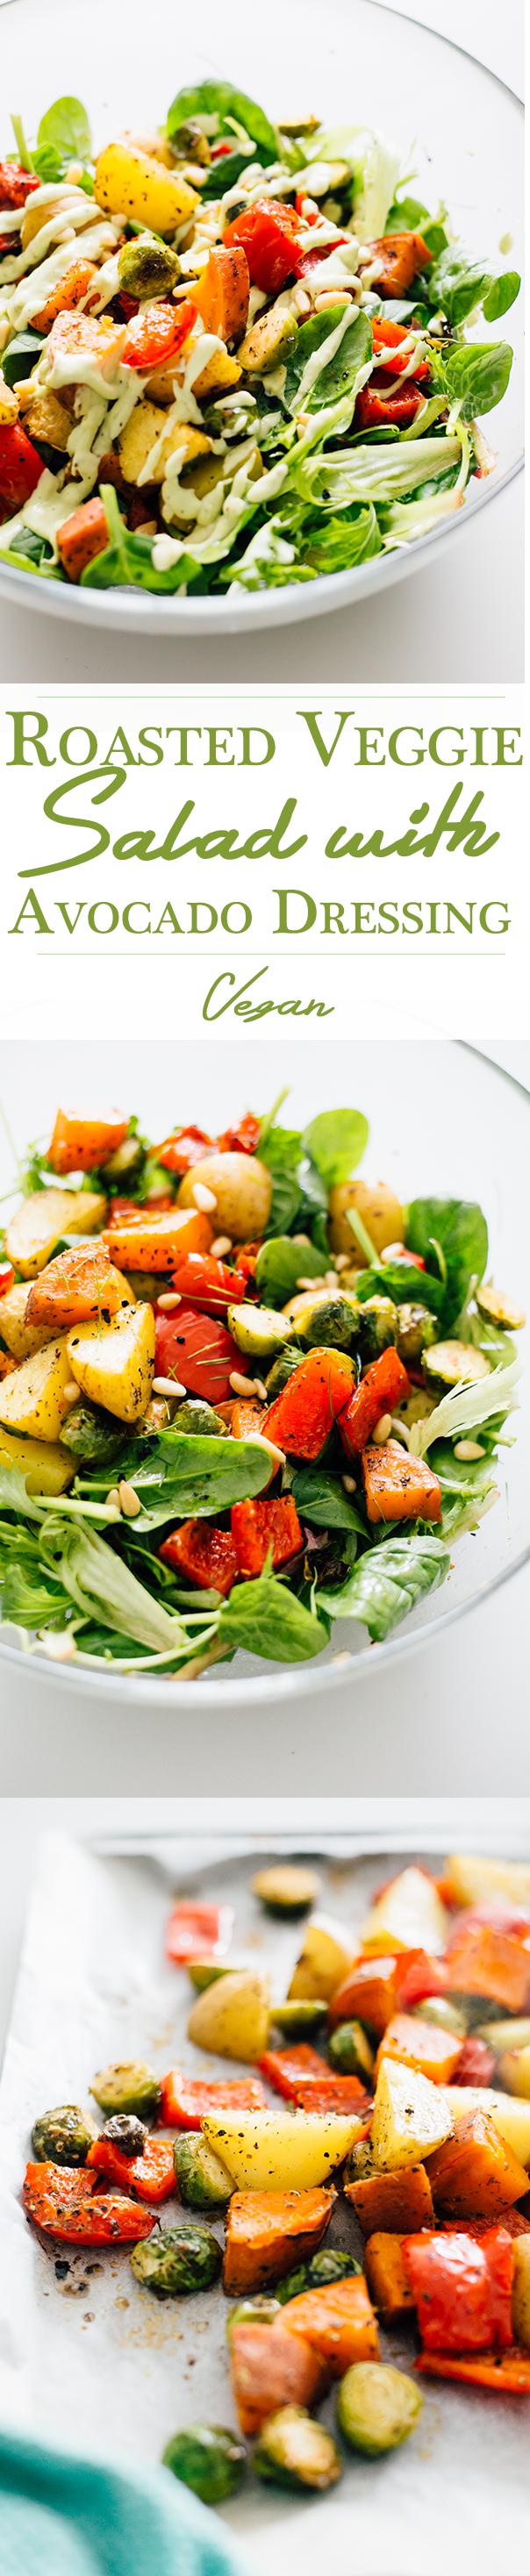 Roasted Vegetable Salad with Creamy Avocado Dressing | Crazy Vegan Kitchen